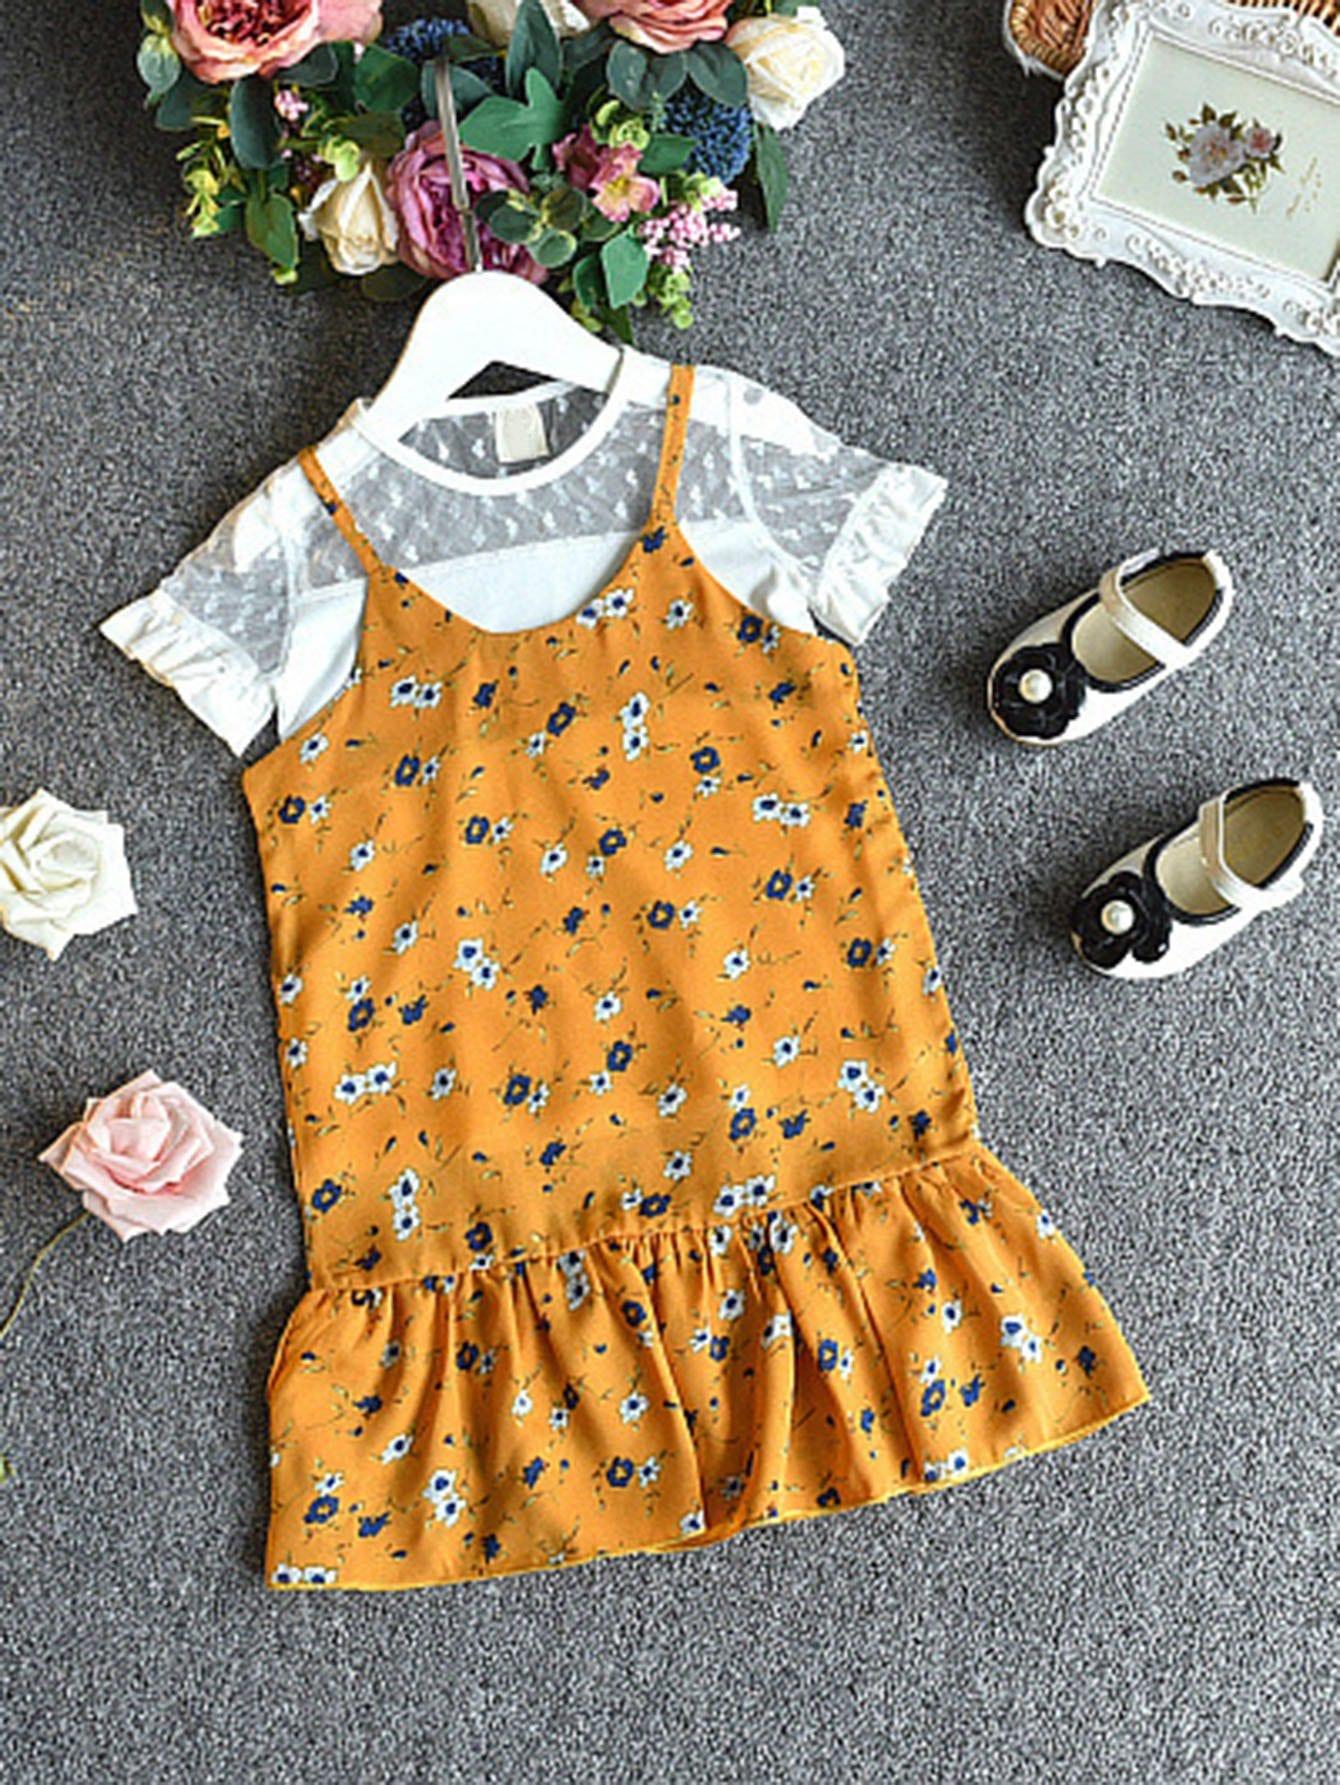 Calico Print Cami Dress With Mesh Panel Top calico print faux pearl detail cami dress